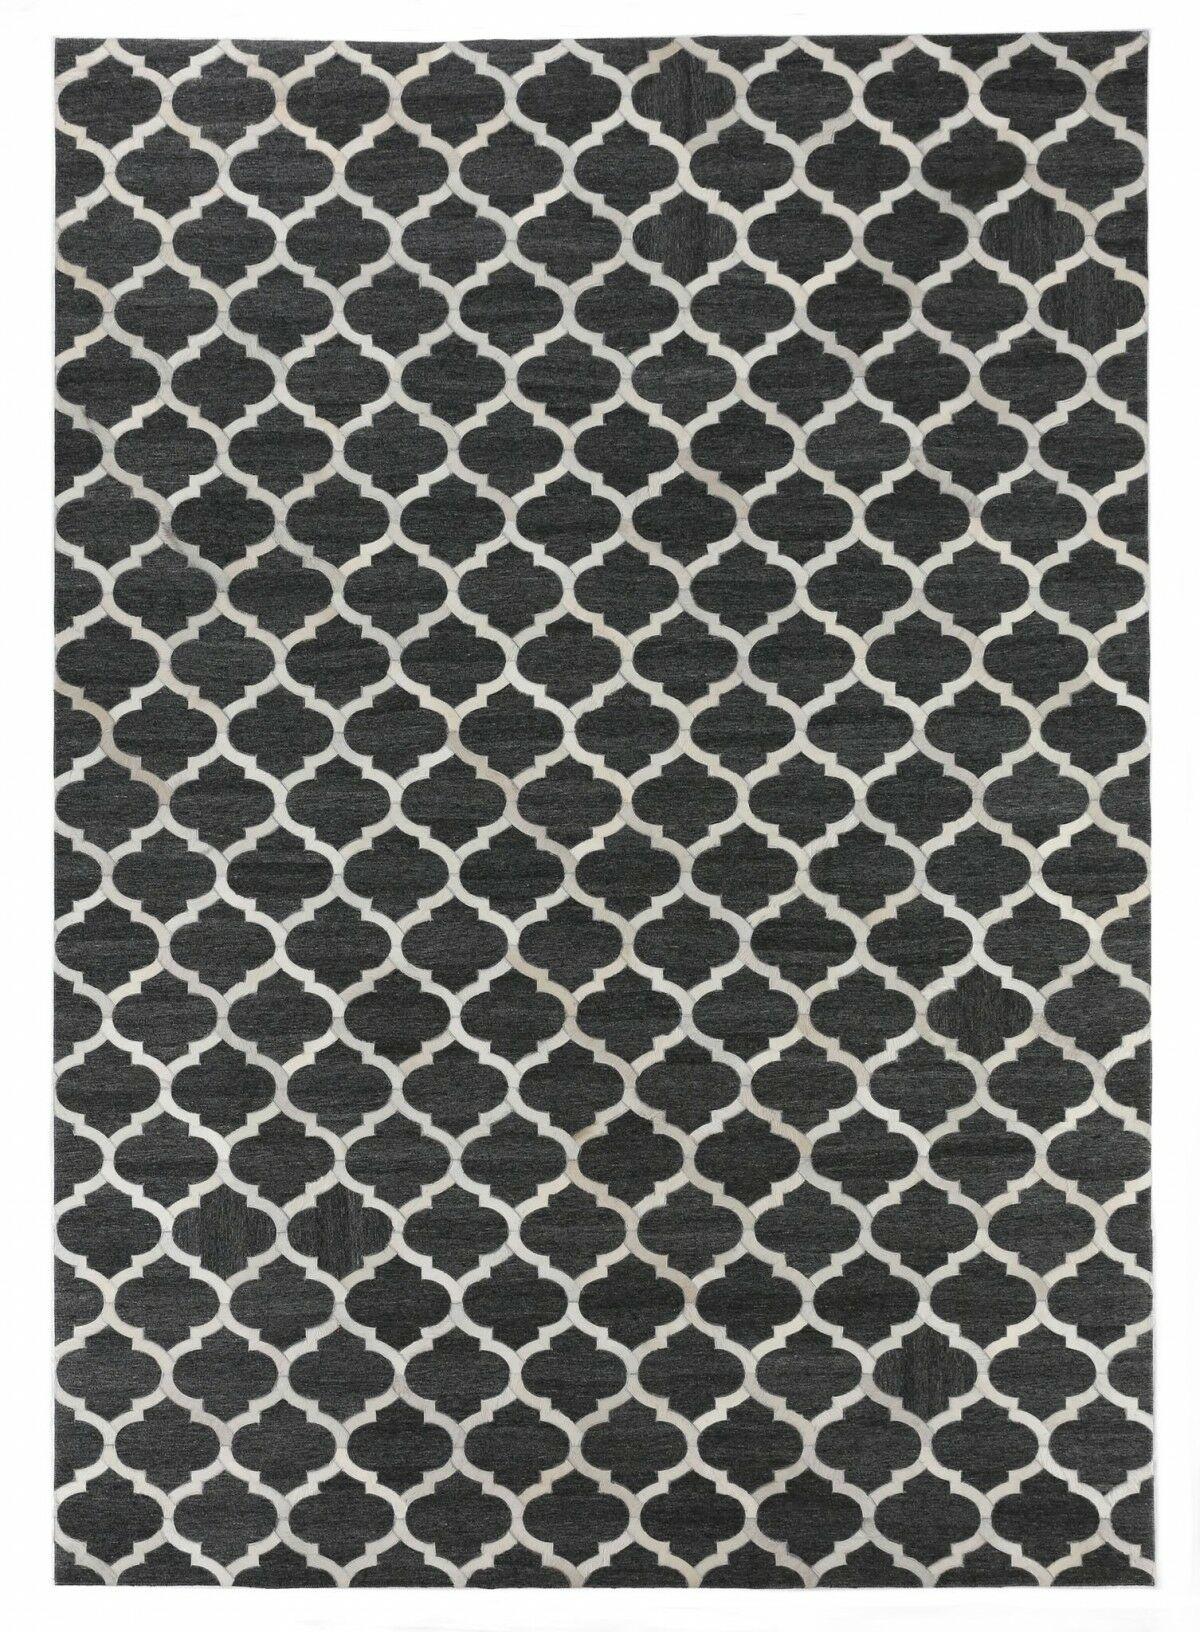 Charcoal/Ivory Area Rug Rug Size: Rectangle 11'6